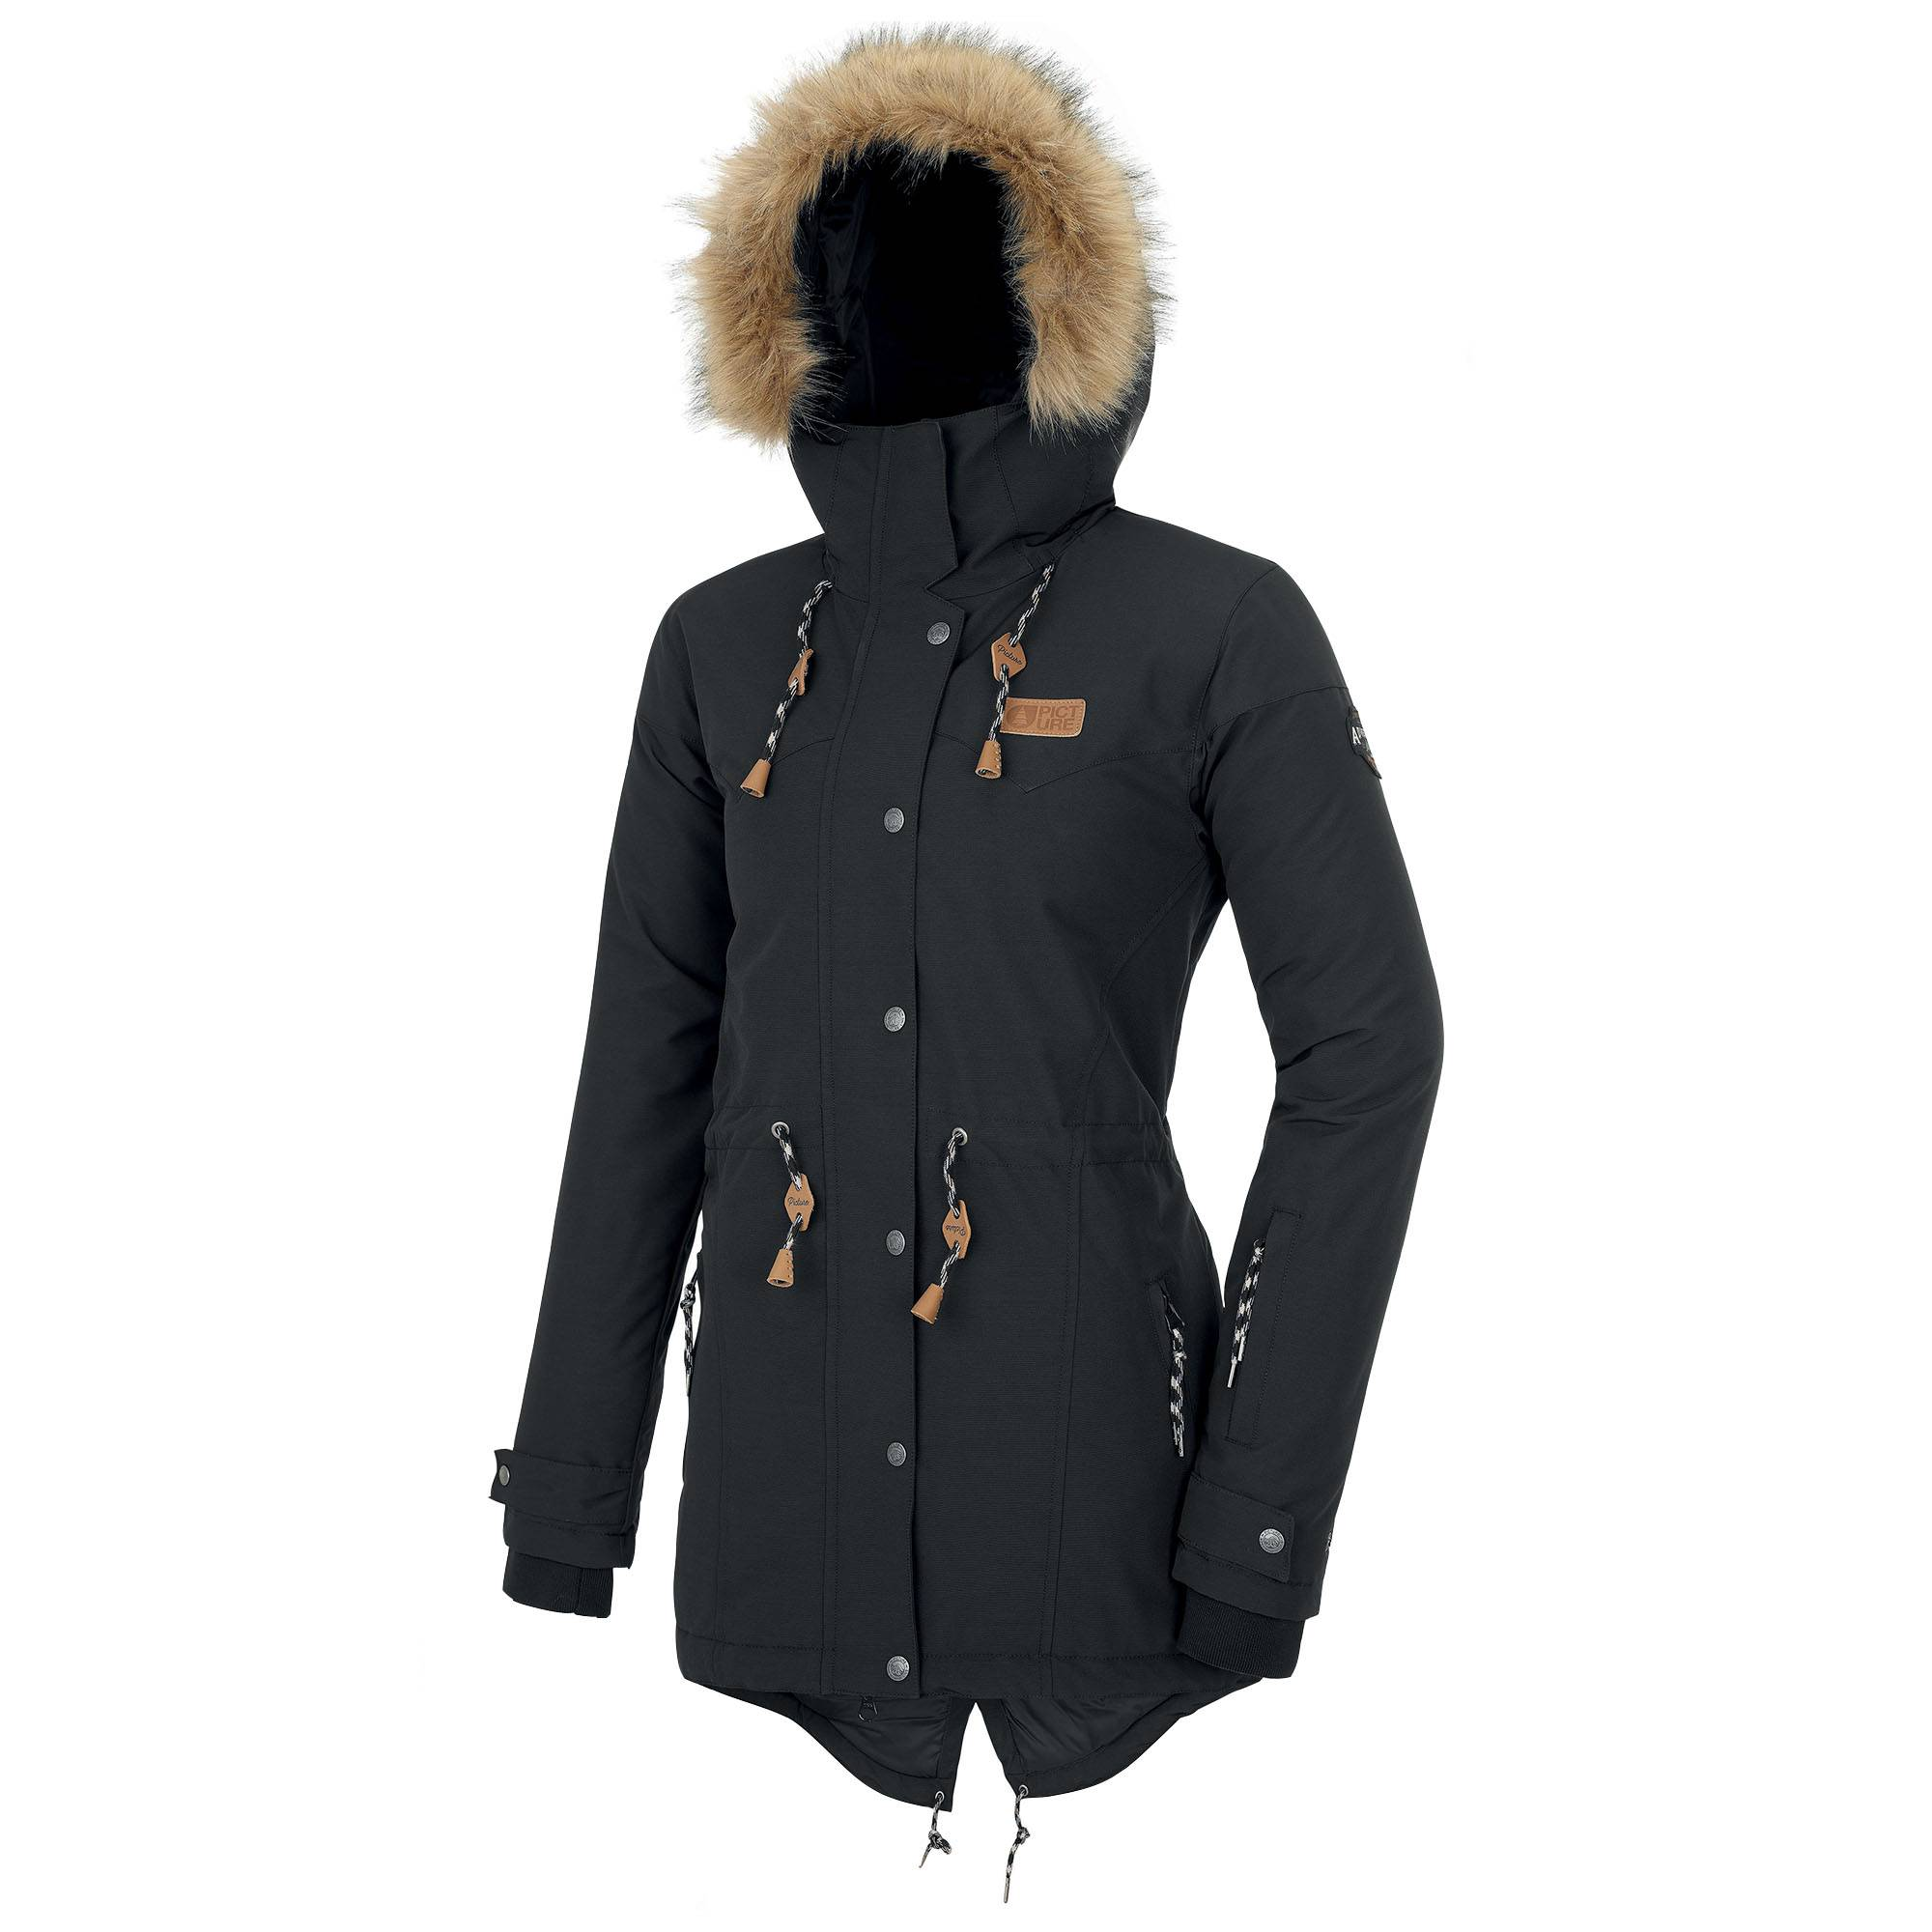 Picture Organic Clothing Women's Katniss Snow Jacket  - Black - Size: Extra Large